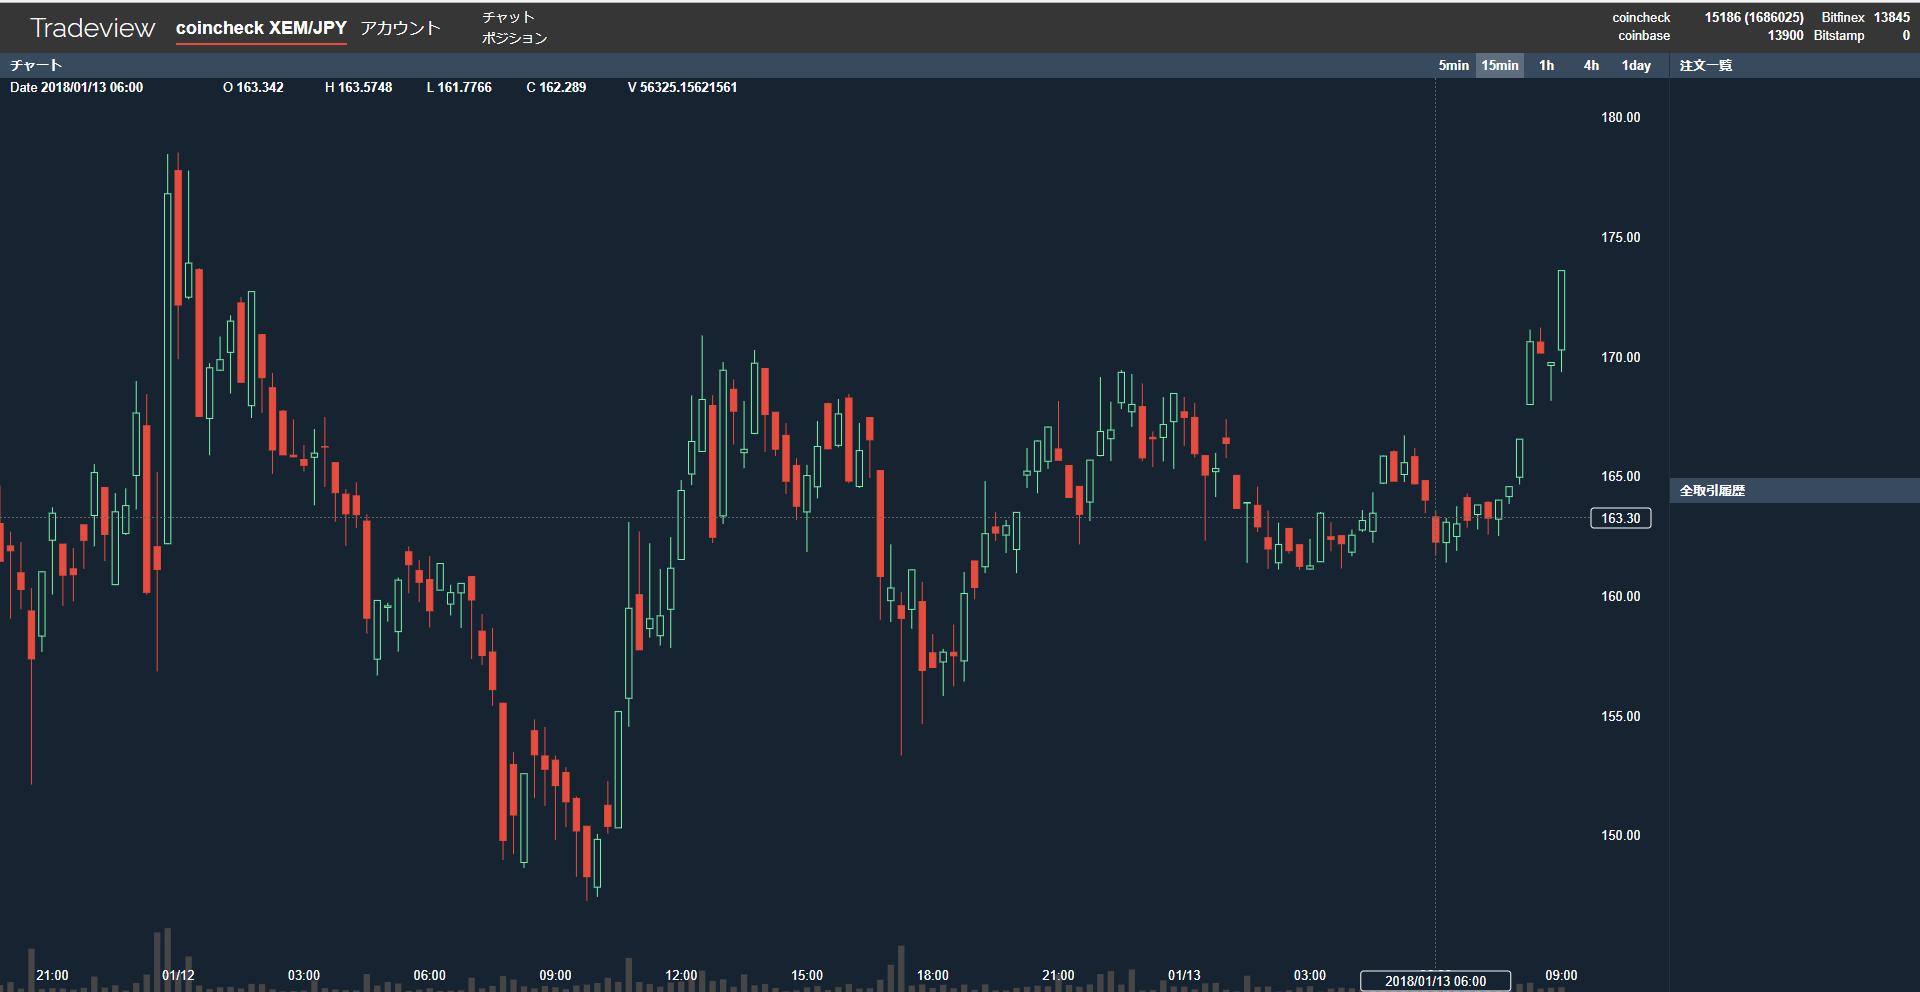 $XEMBTC (NEMネム)上昇中!0.00010168BTC 仮想通貨値動き:アルトコイン(草コイン)チャート速報 2018-01-04 63712 AM Coincheckこいんちぇっく